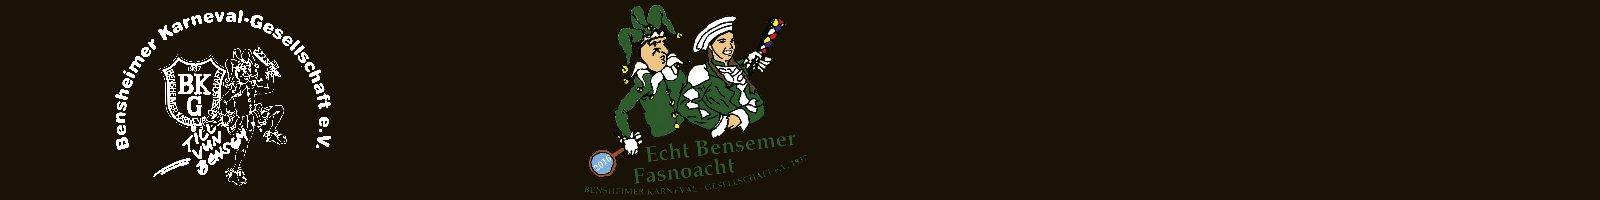 Bensheimer Karneval-Gesellschaft e.V.